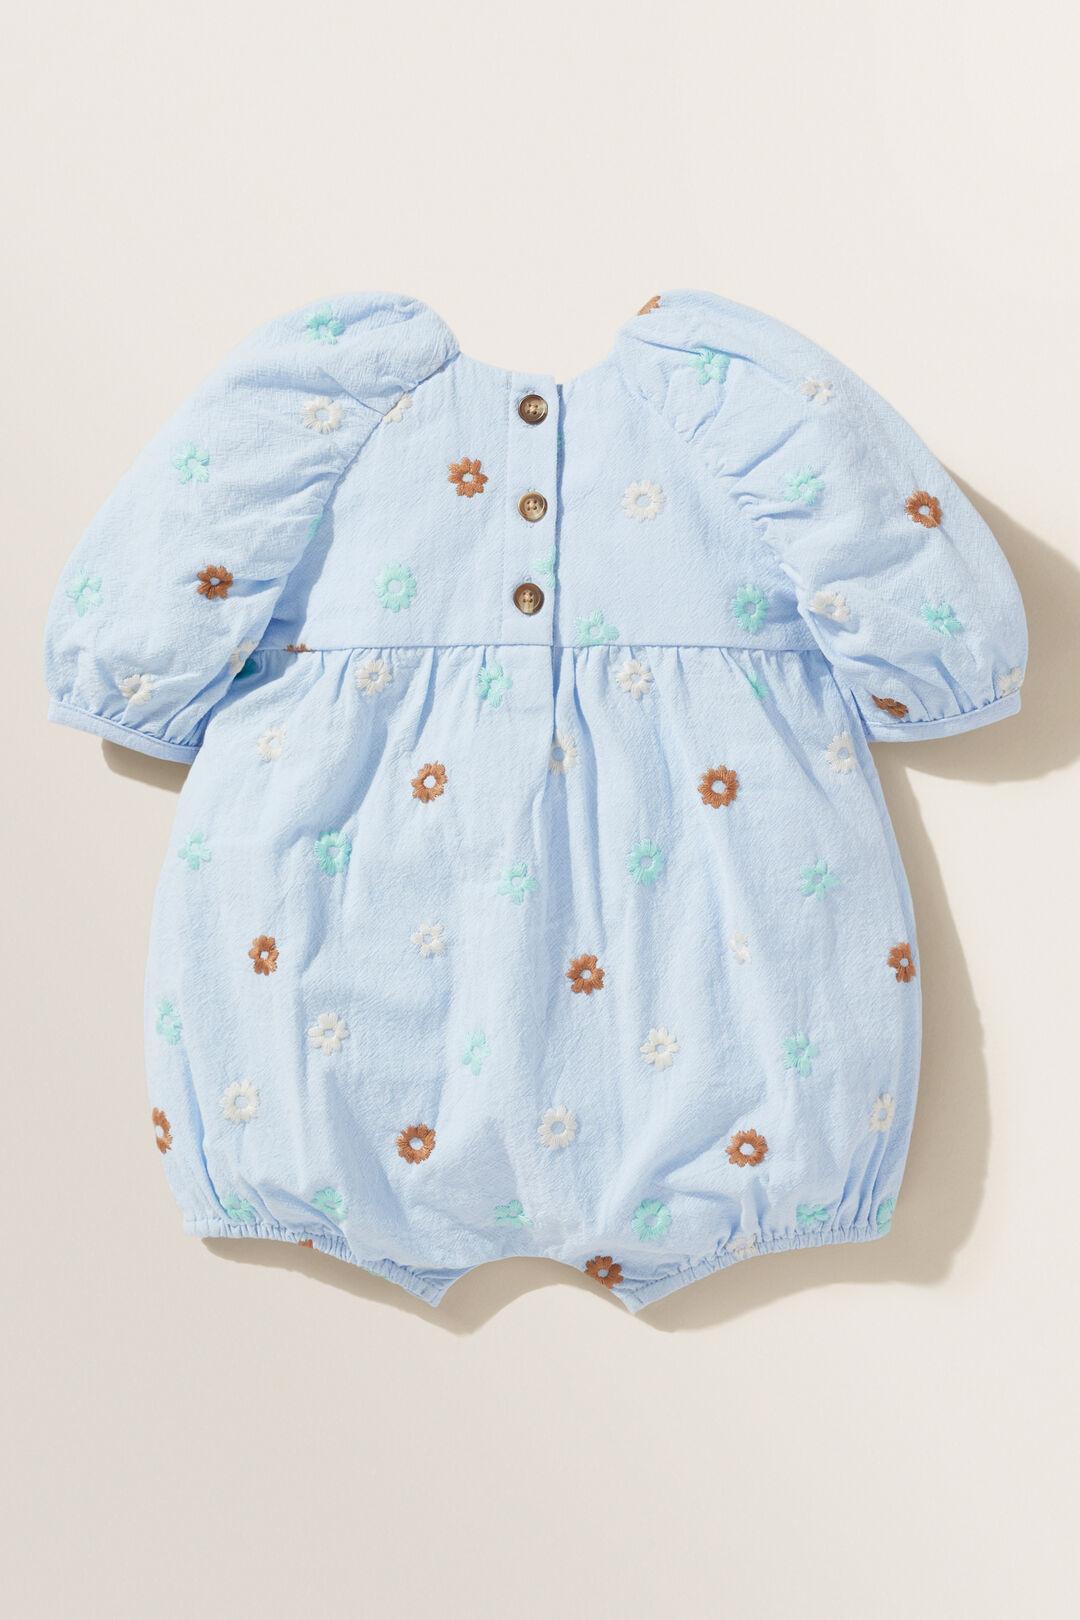 Embroidered Floral Romper  BABY BLUE  hi-res